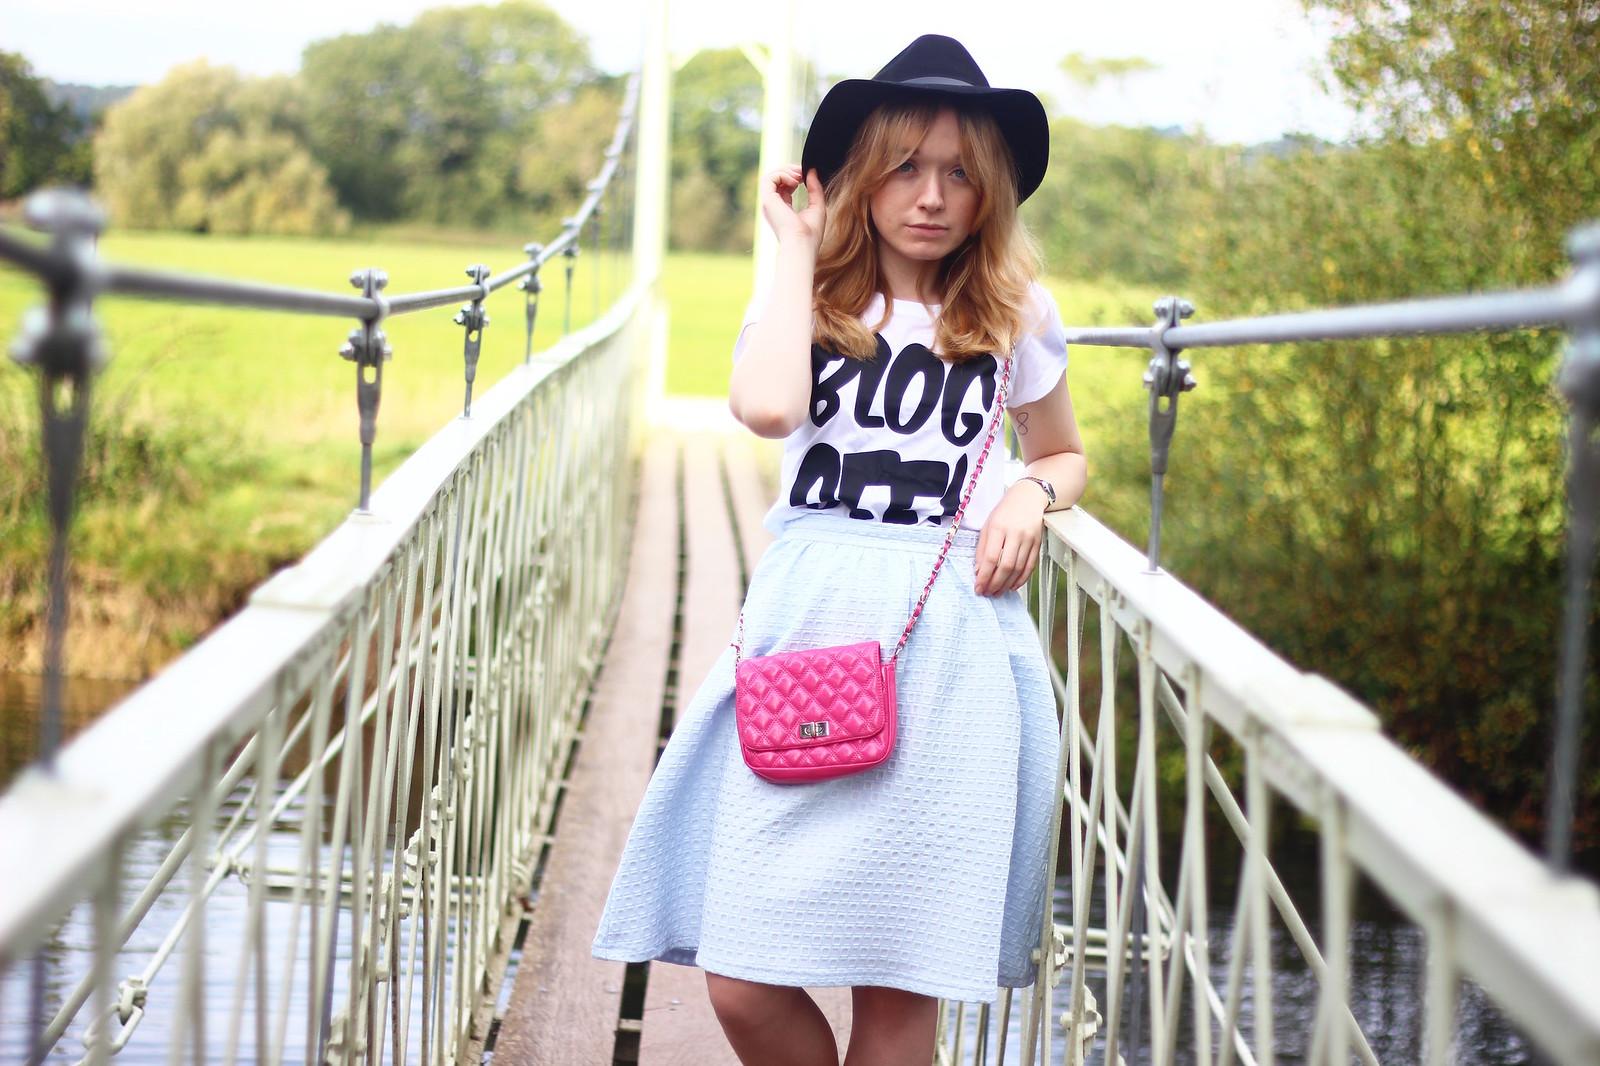 2bloggertshirt